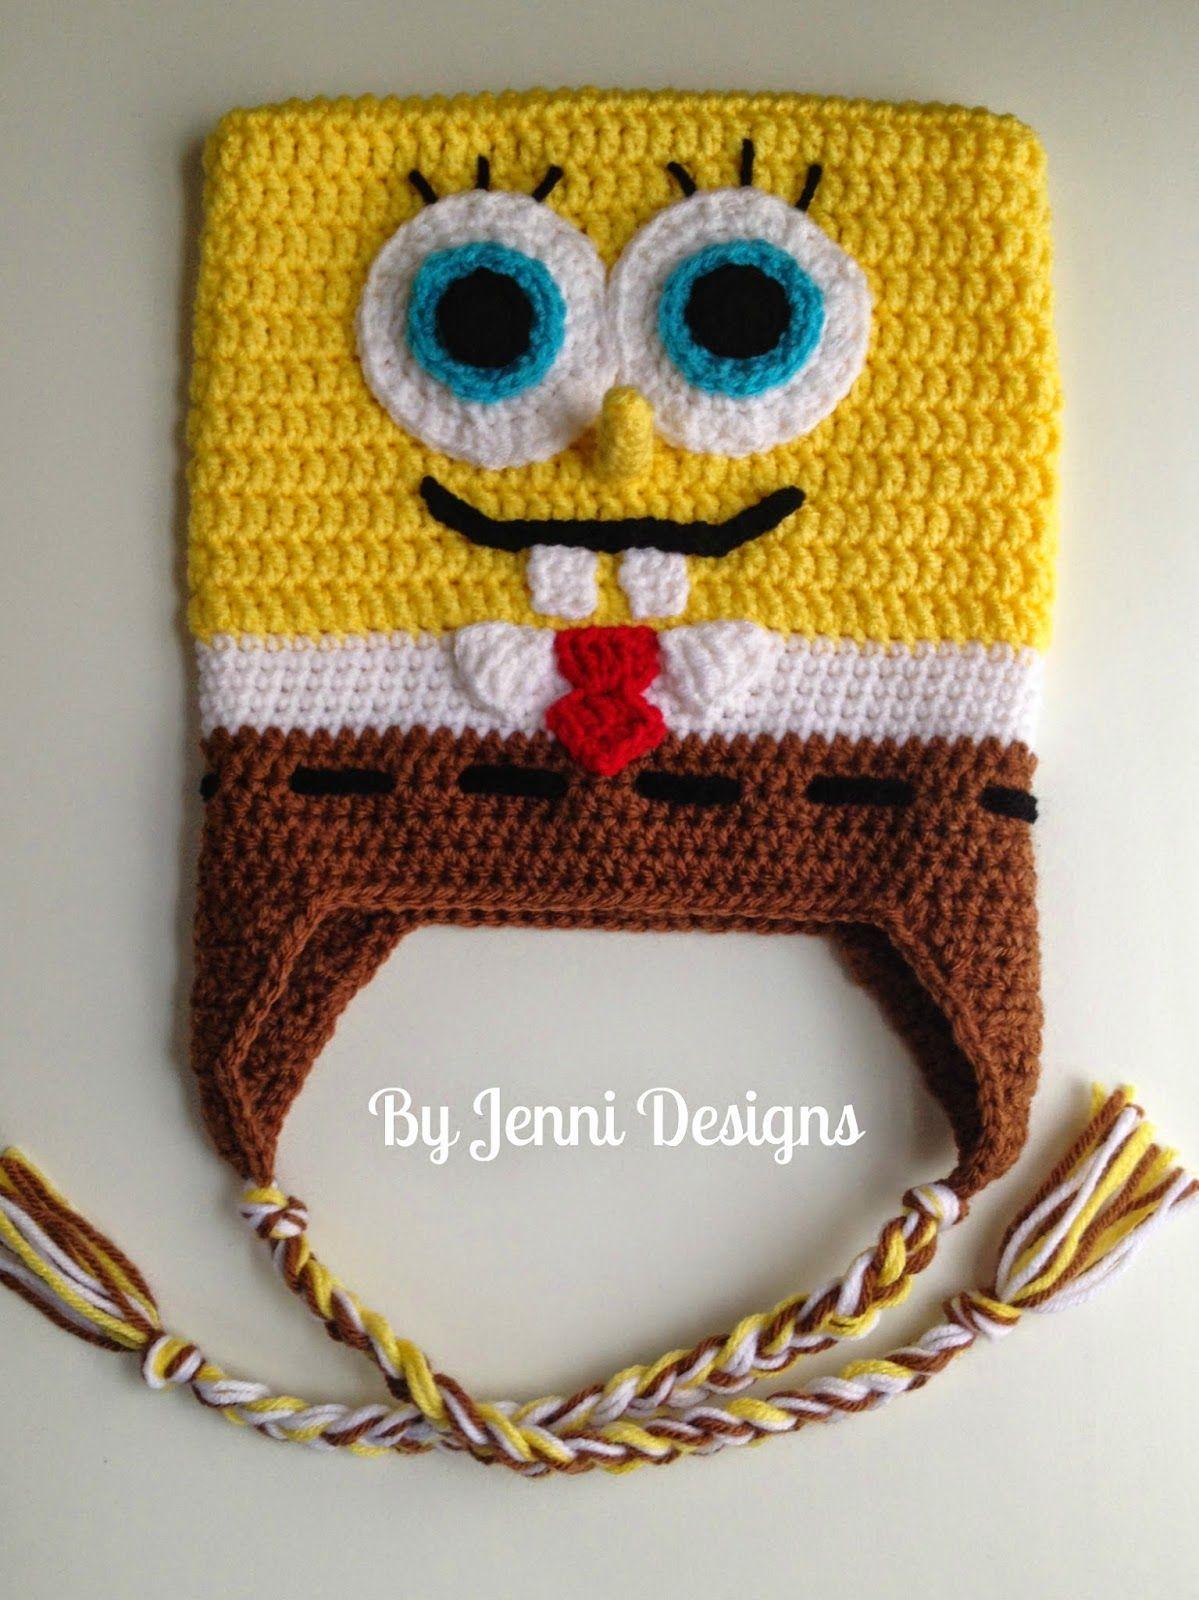 Free Crochet Pattern: Spongebob Squarepants Inspired Hat   Crochet ...